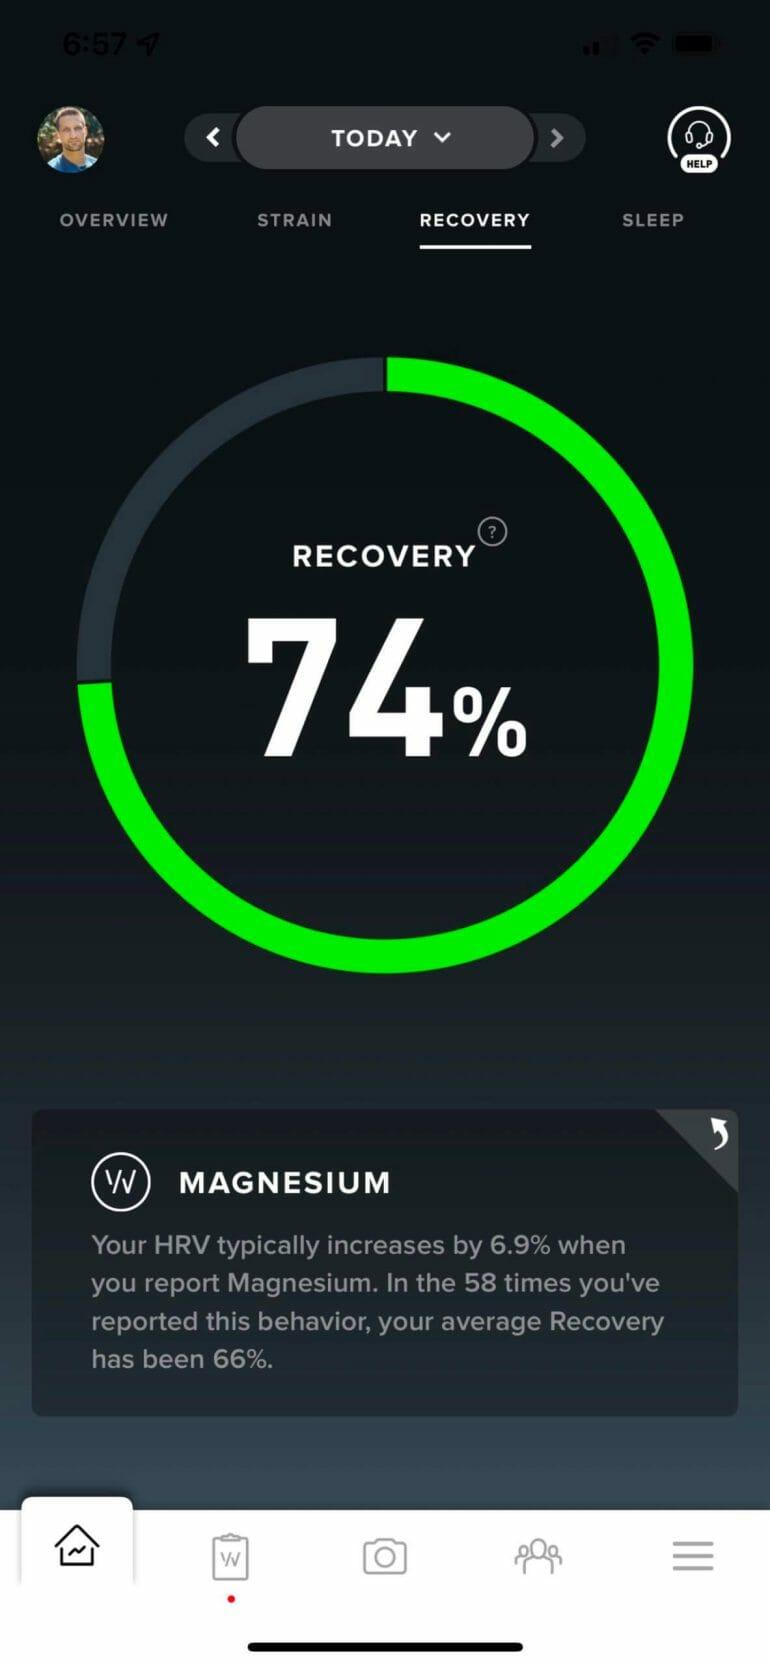 Magnesium influences my Recovery score